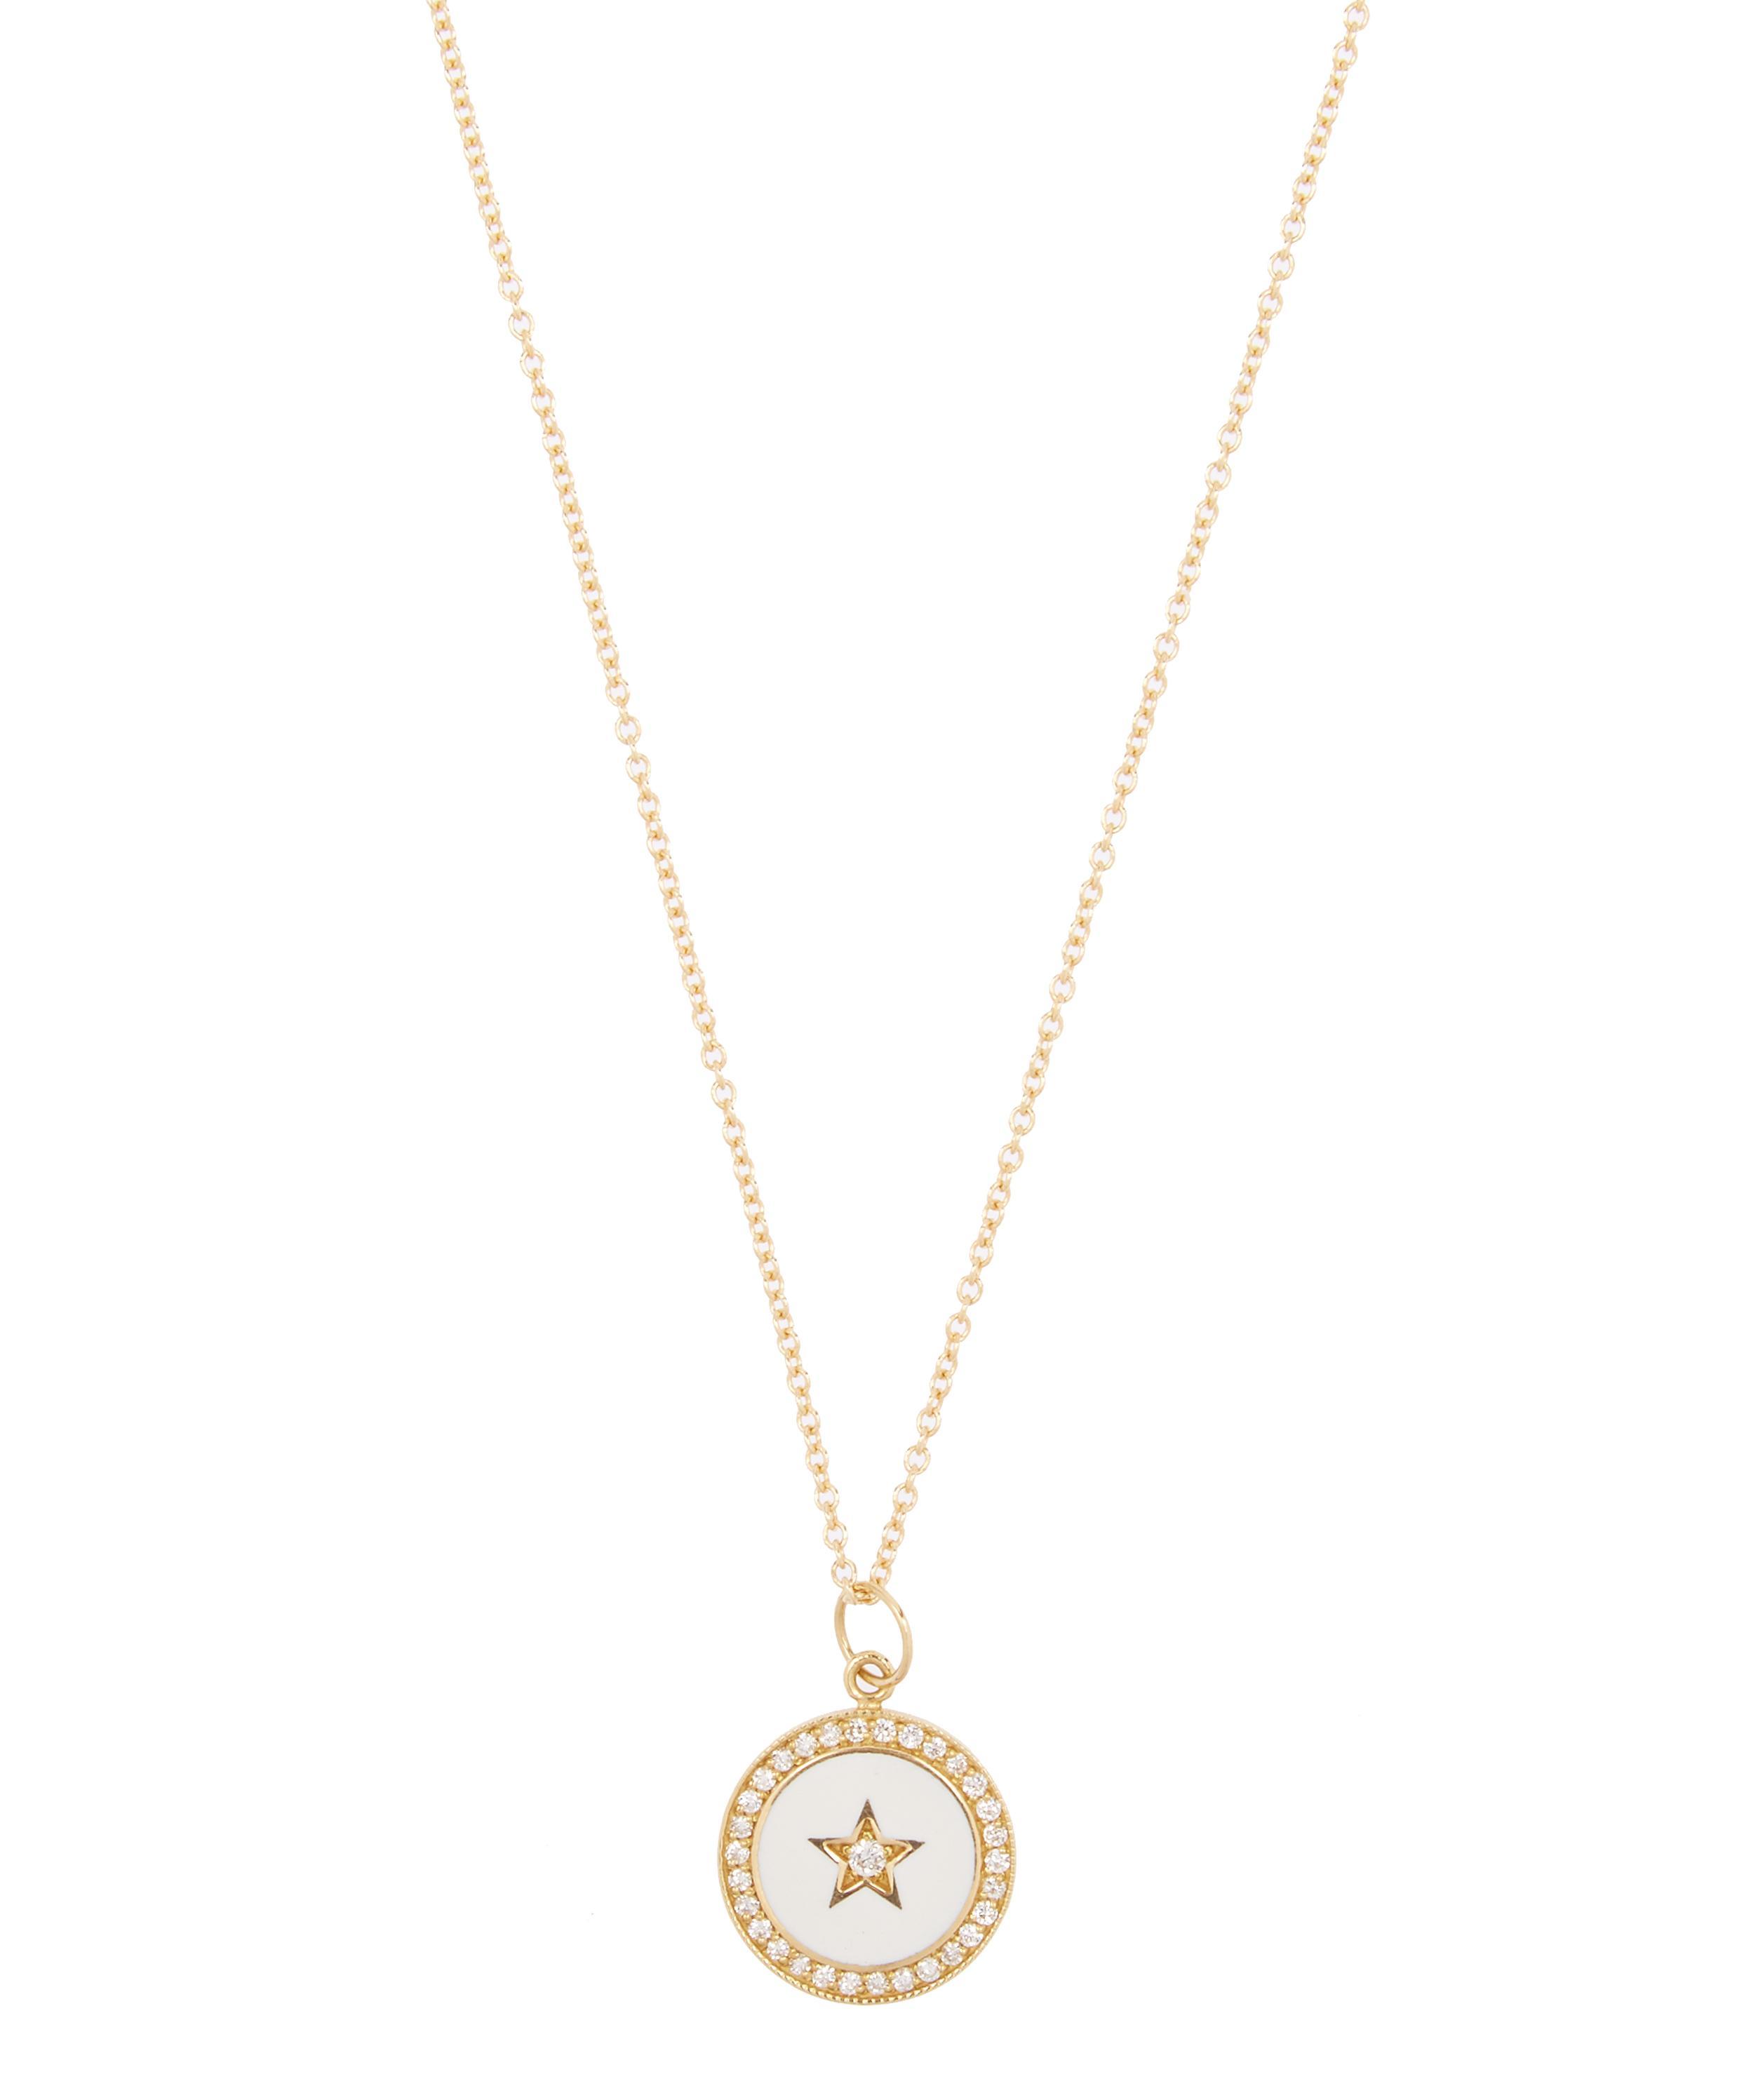 ccb10f745 Gold Diamond Enamel Full Moon Star Necklace